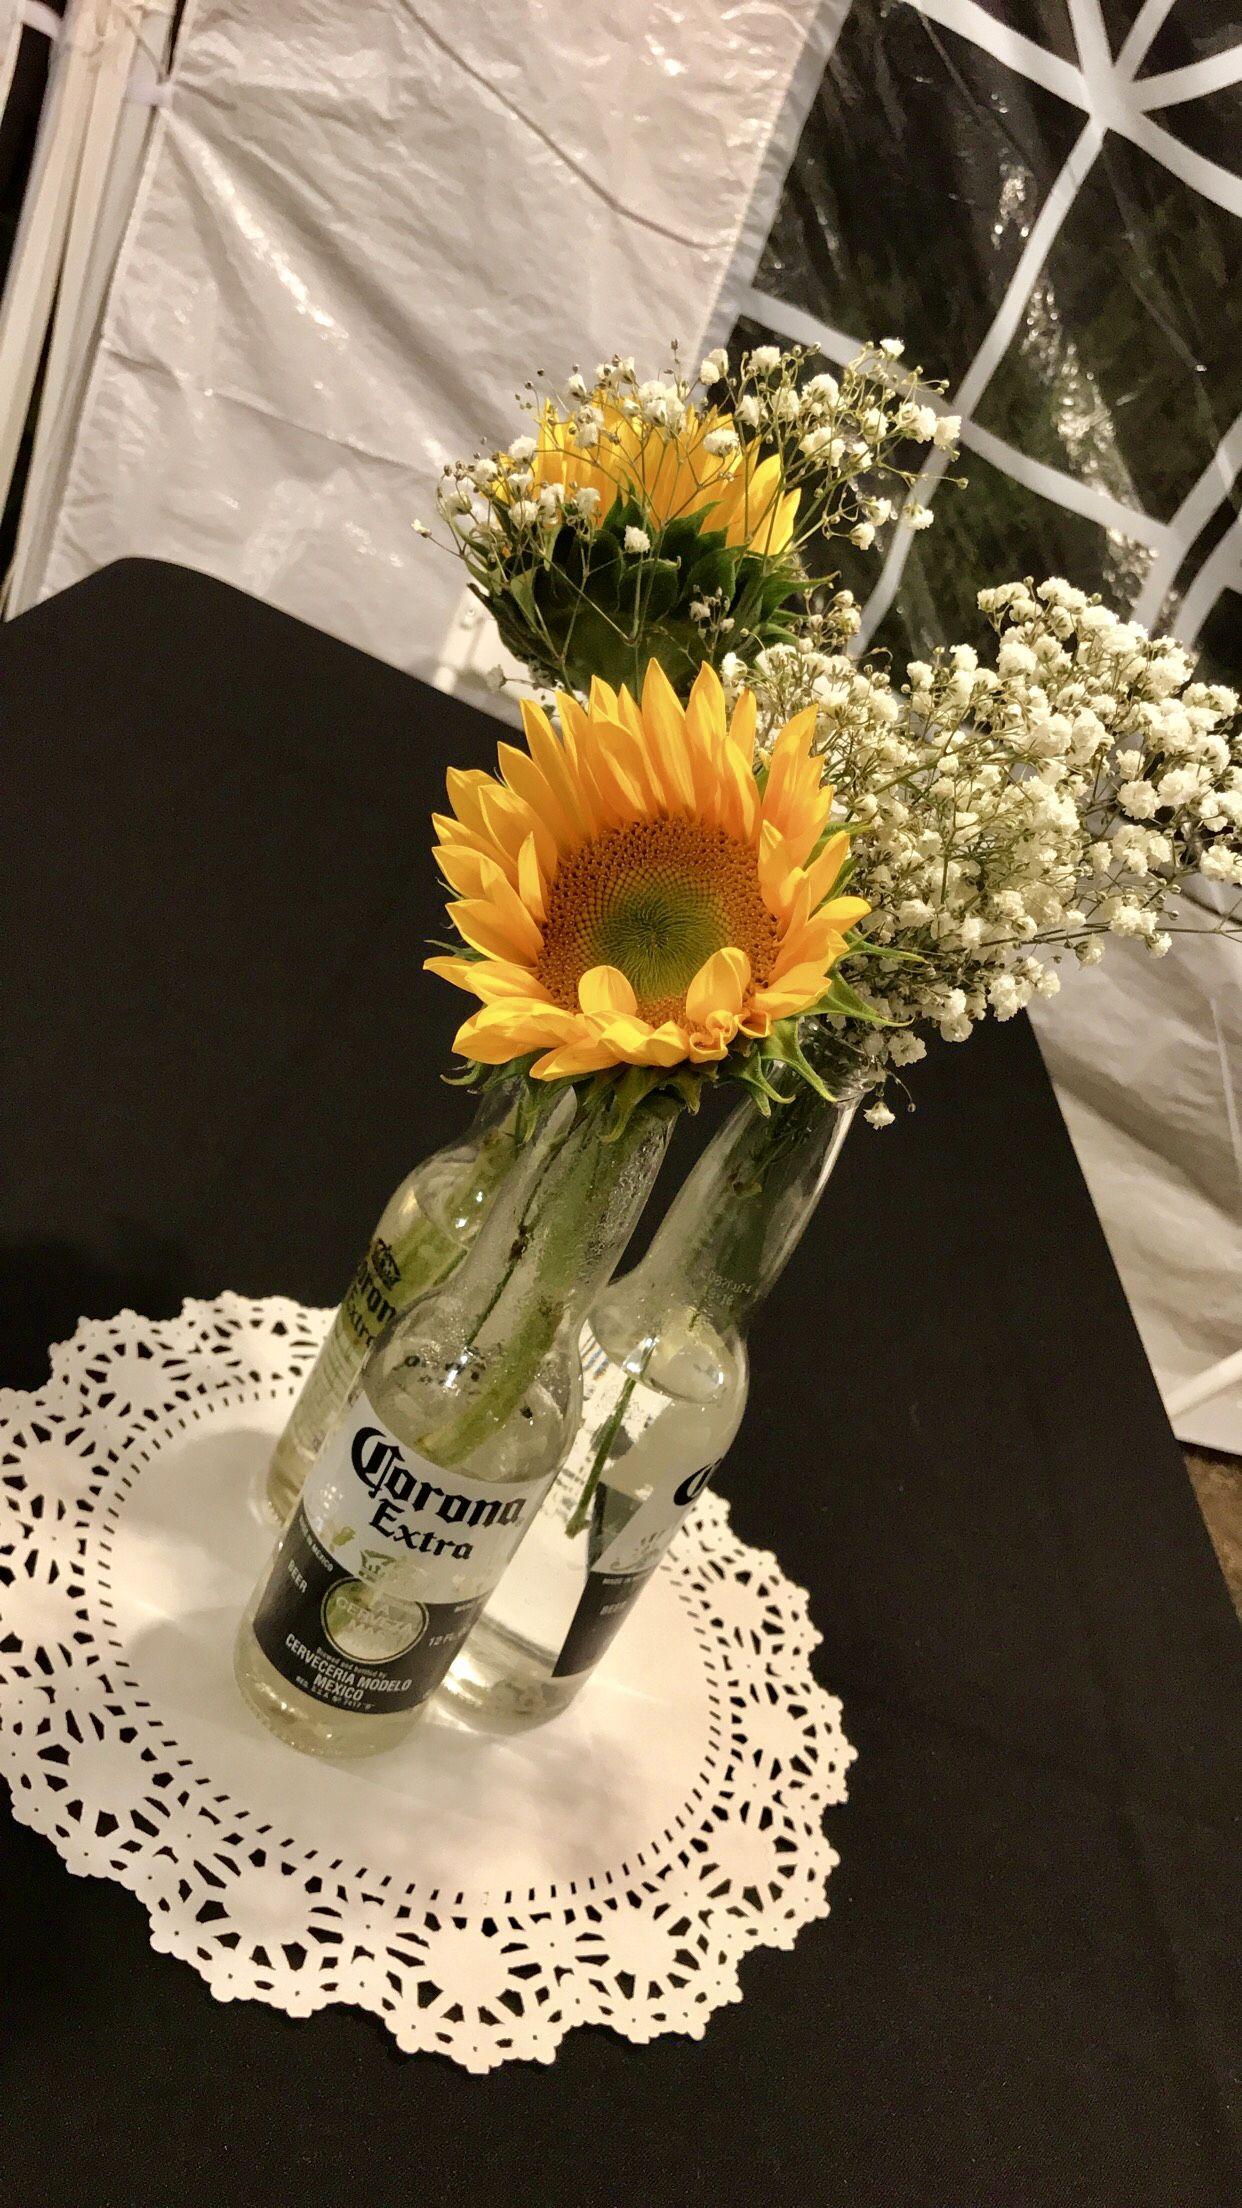 Enjoyable Sunflower Centerpieces Beer Theme Sunflower Theme Corona Home Interior And Landscaping Oversignezvosmurscom